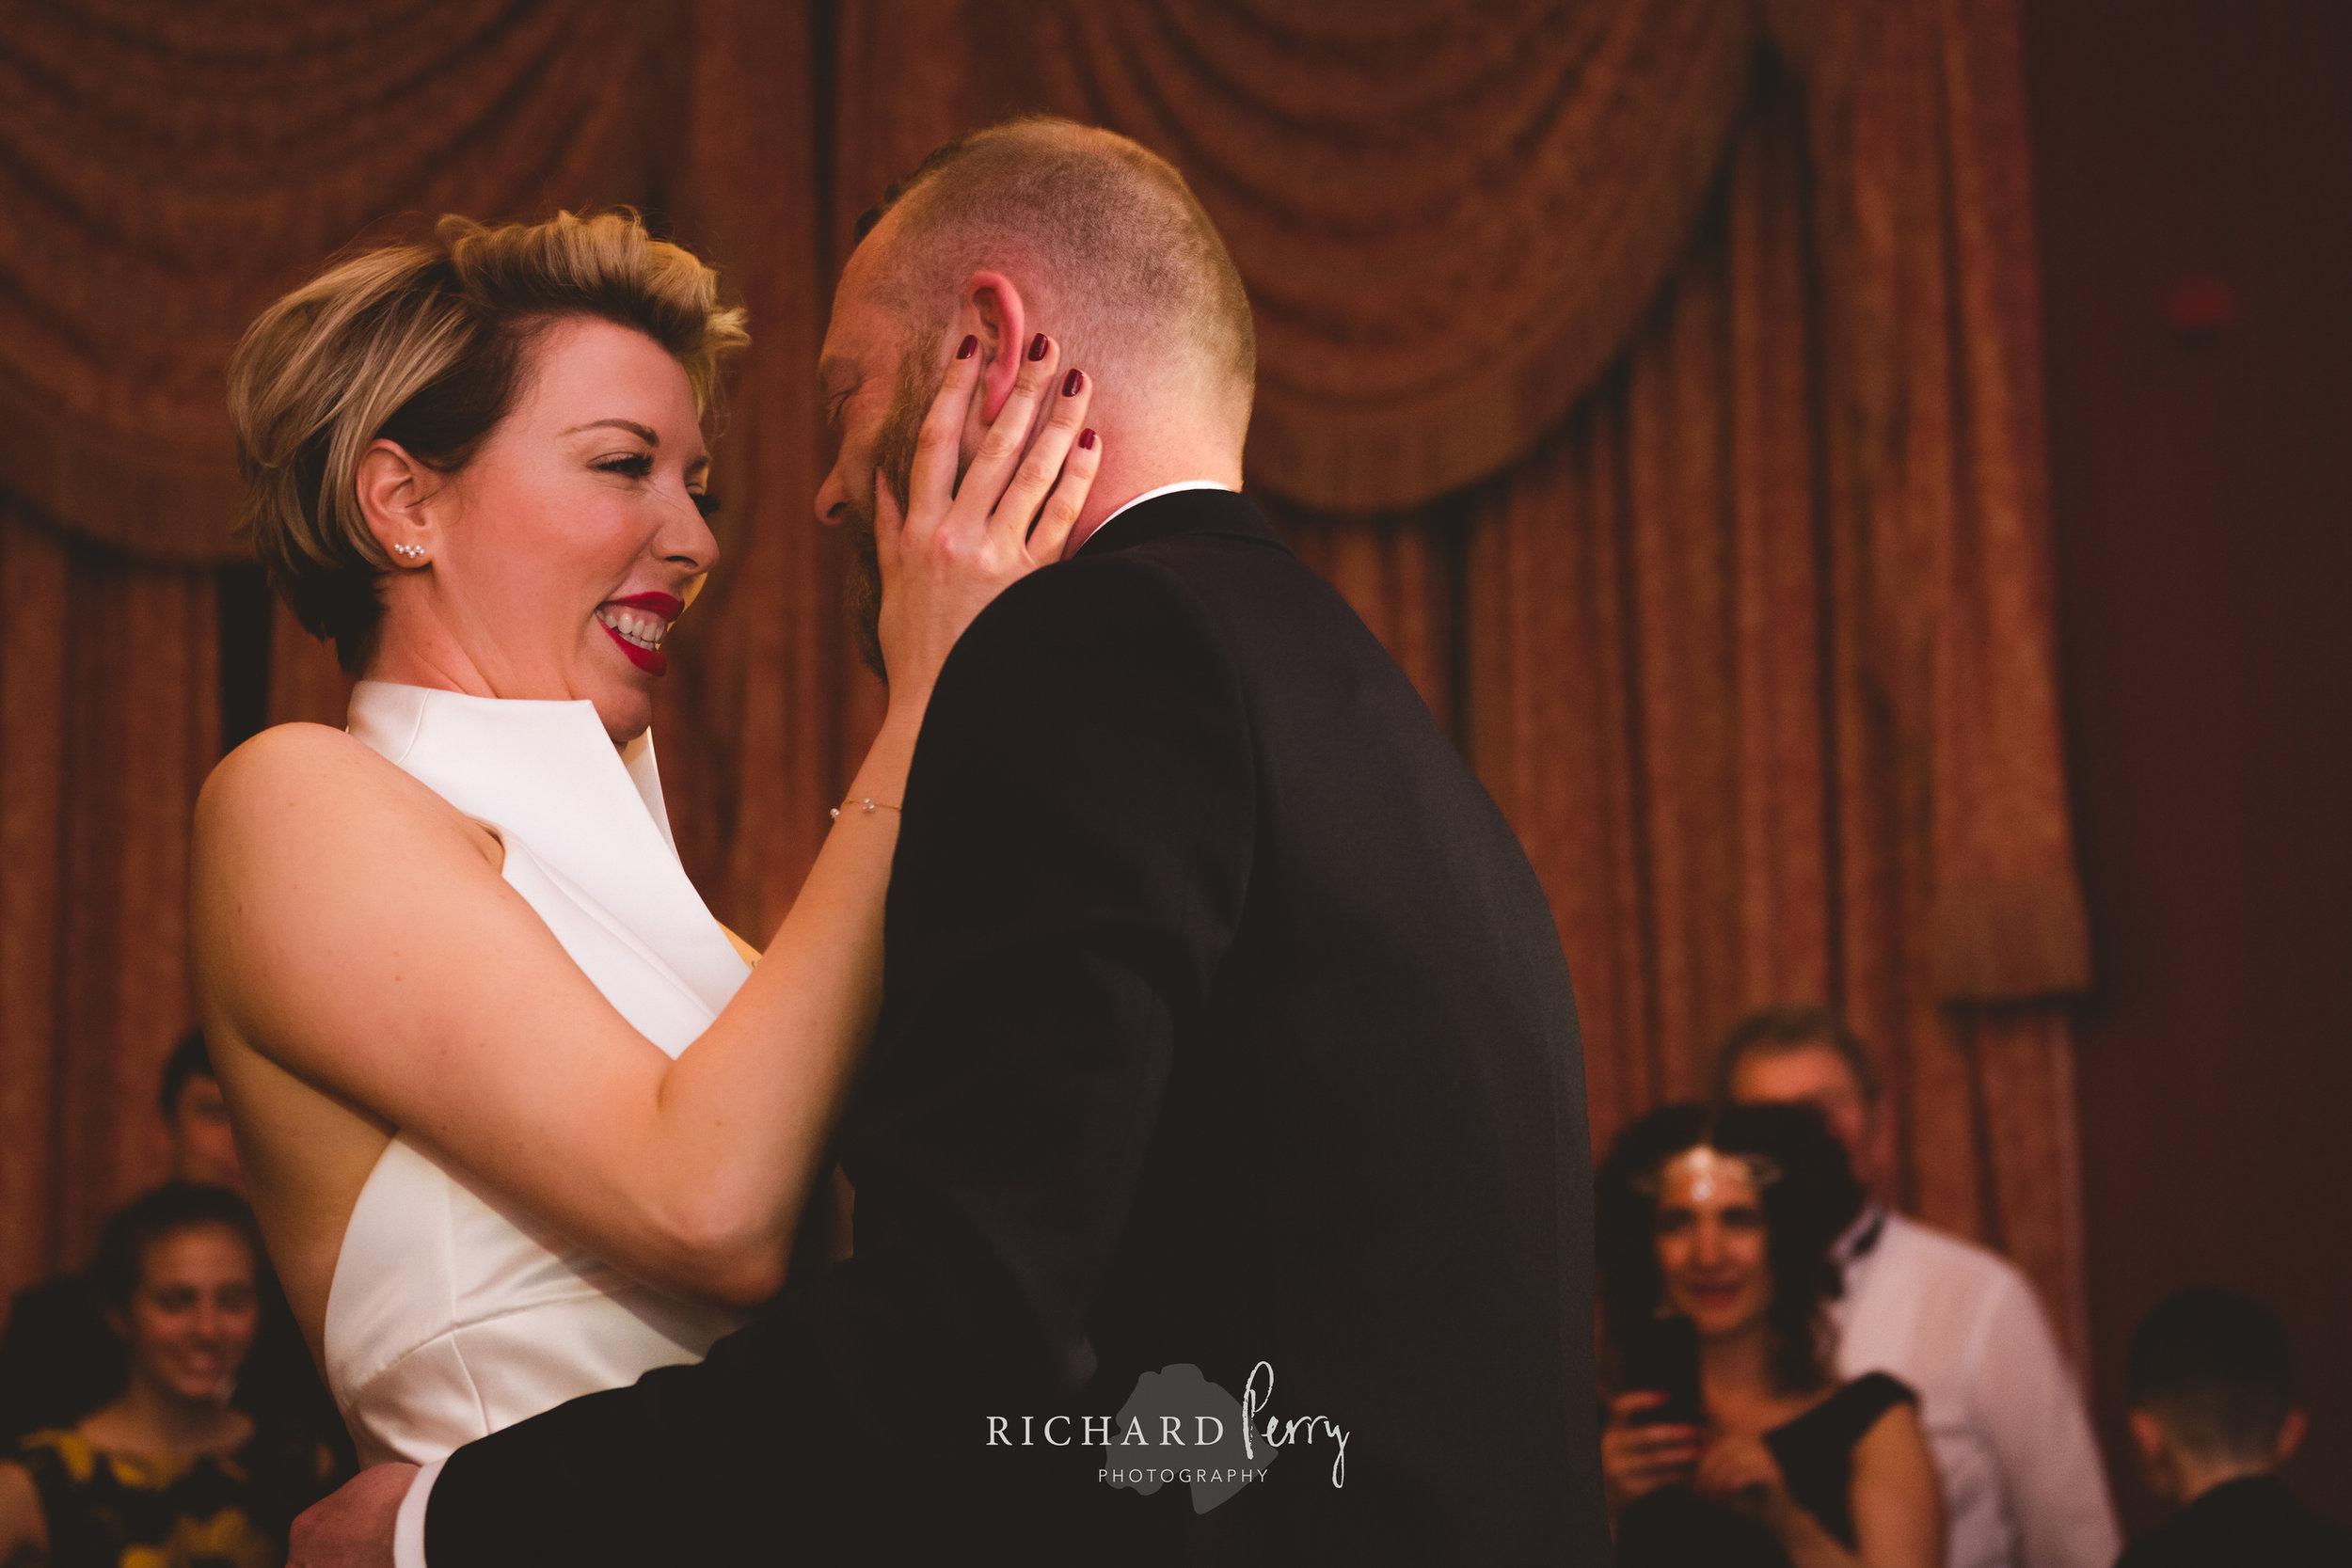 yorkshire-wedding-photographer-destination-archerfield-house-27.jpg